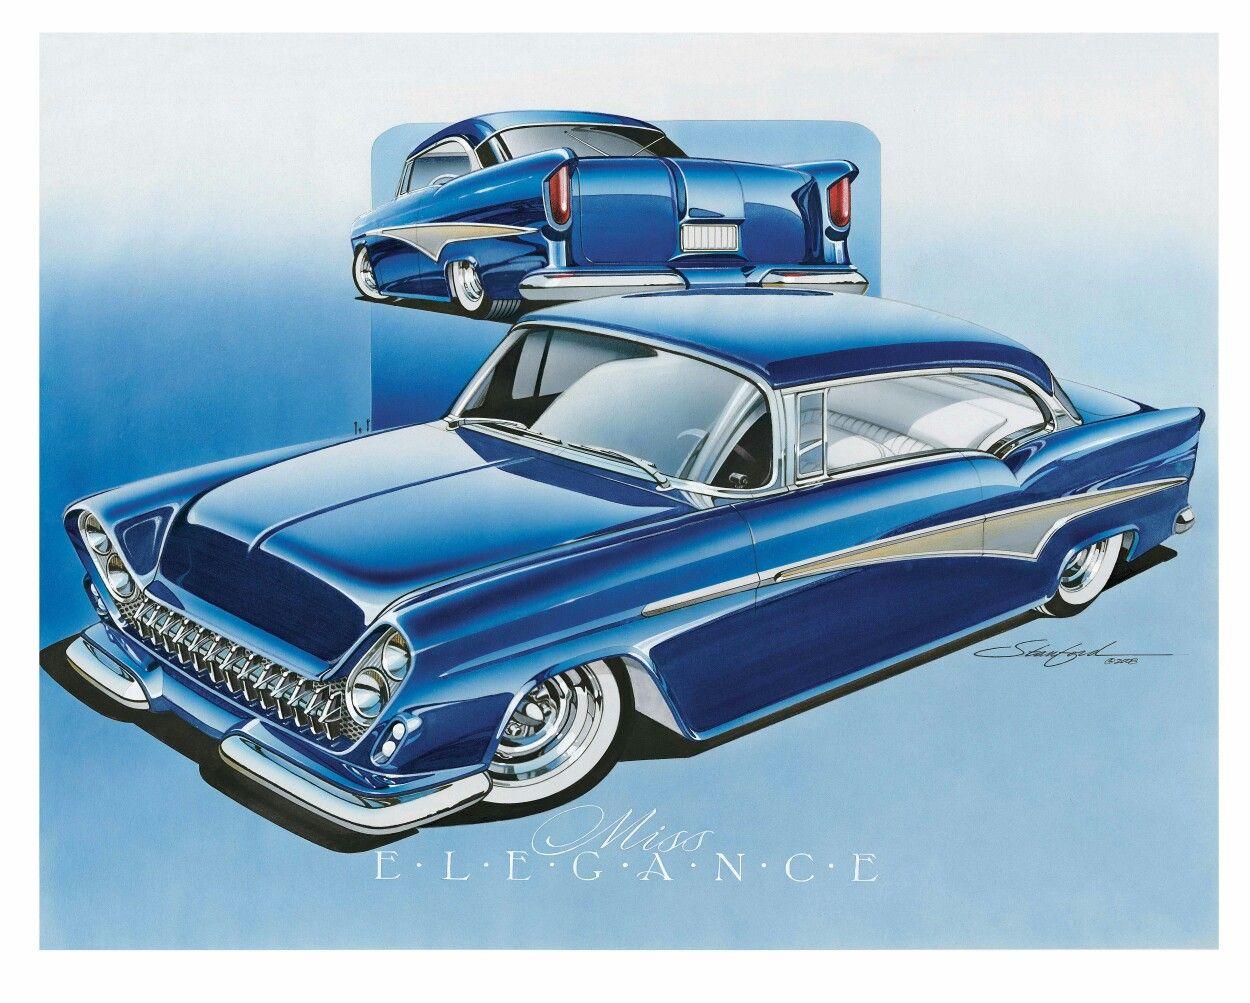 http://www.hotrod.com/articles/coolest-street-cruisers-pen-steve ...